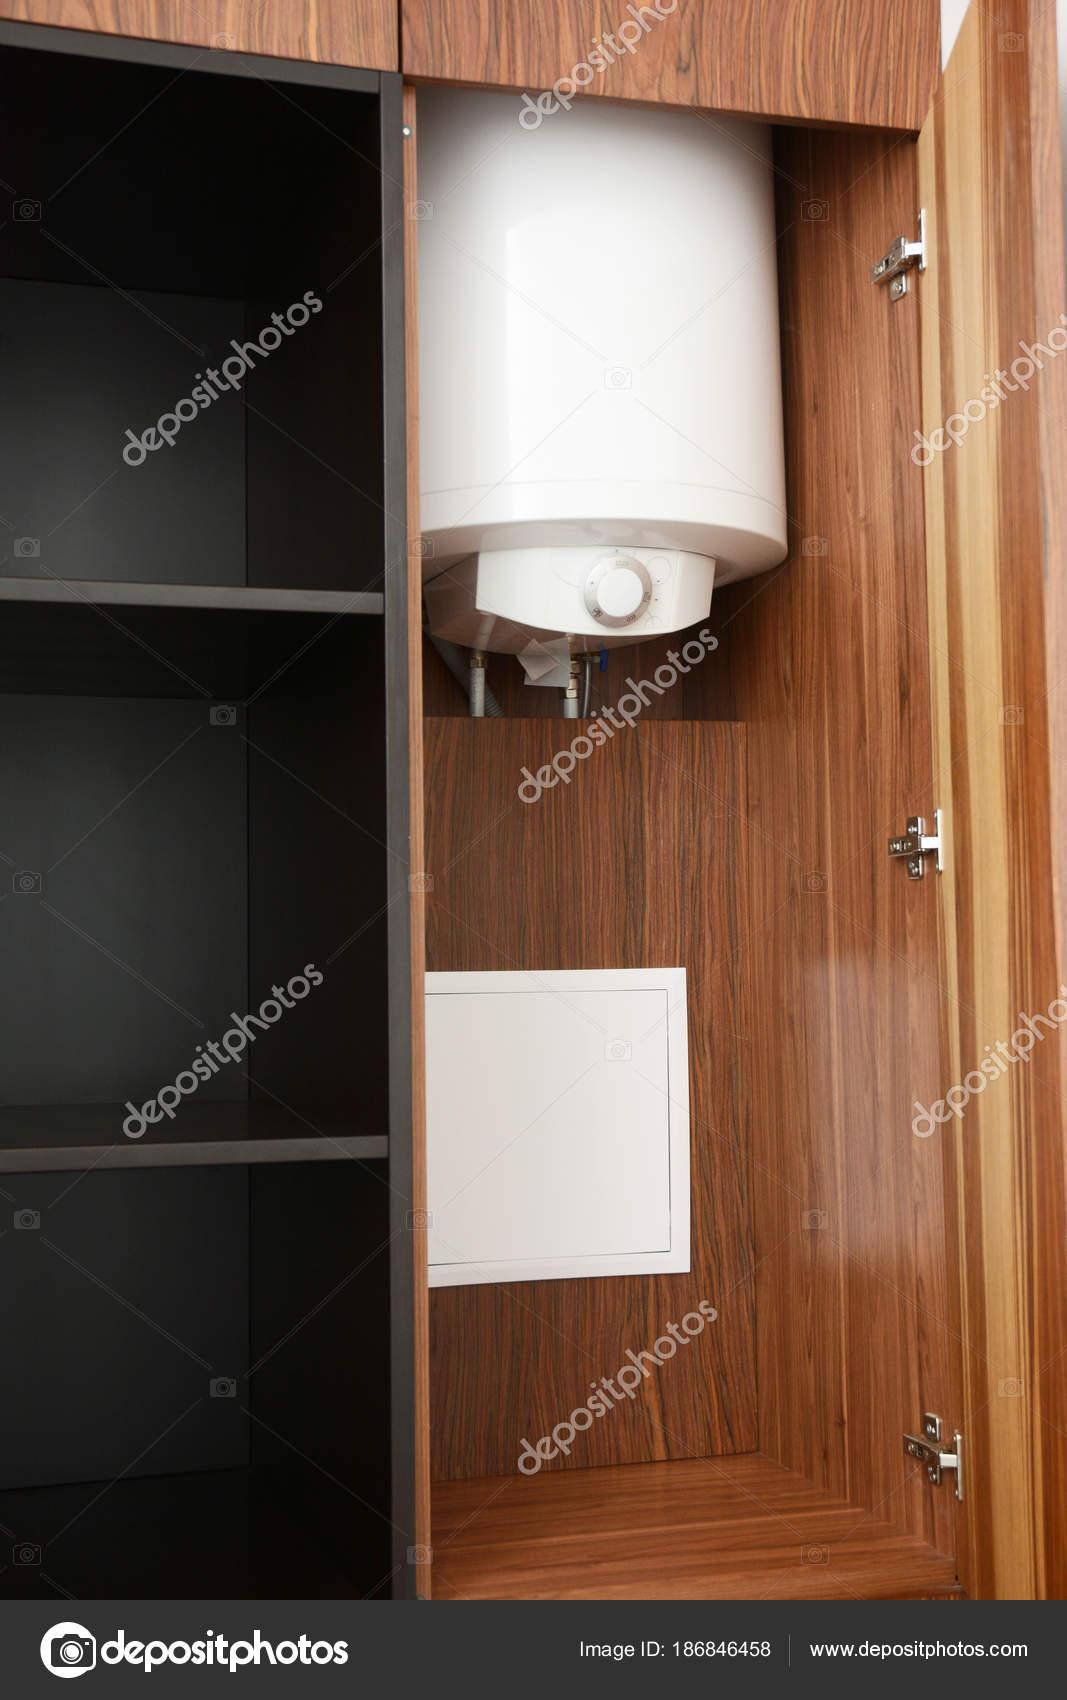 Nascondere la caldaia a condensazione in armadio caldaia - Caldaia per casa 3 piani ...